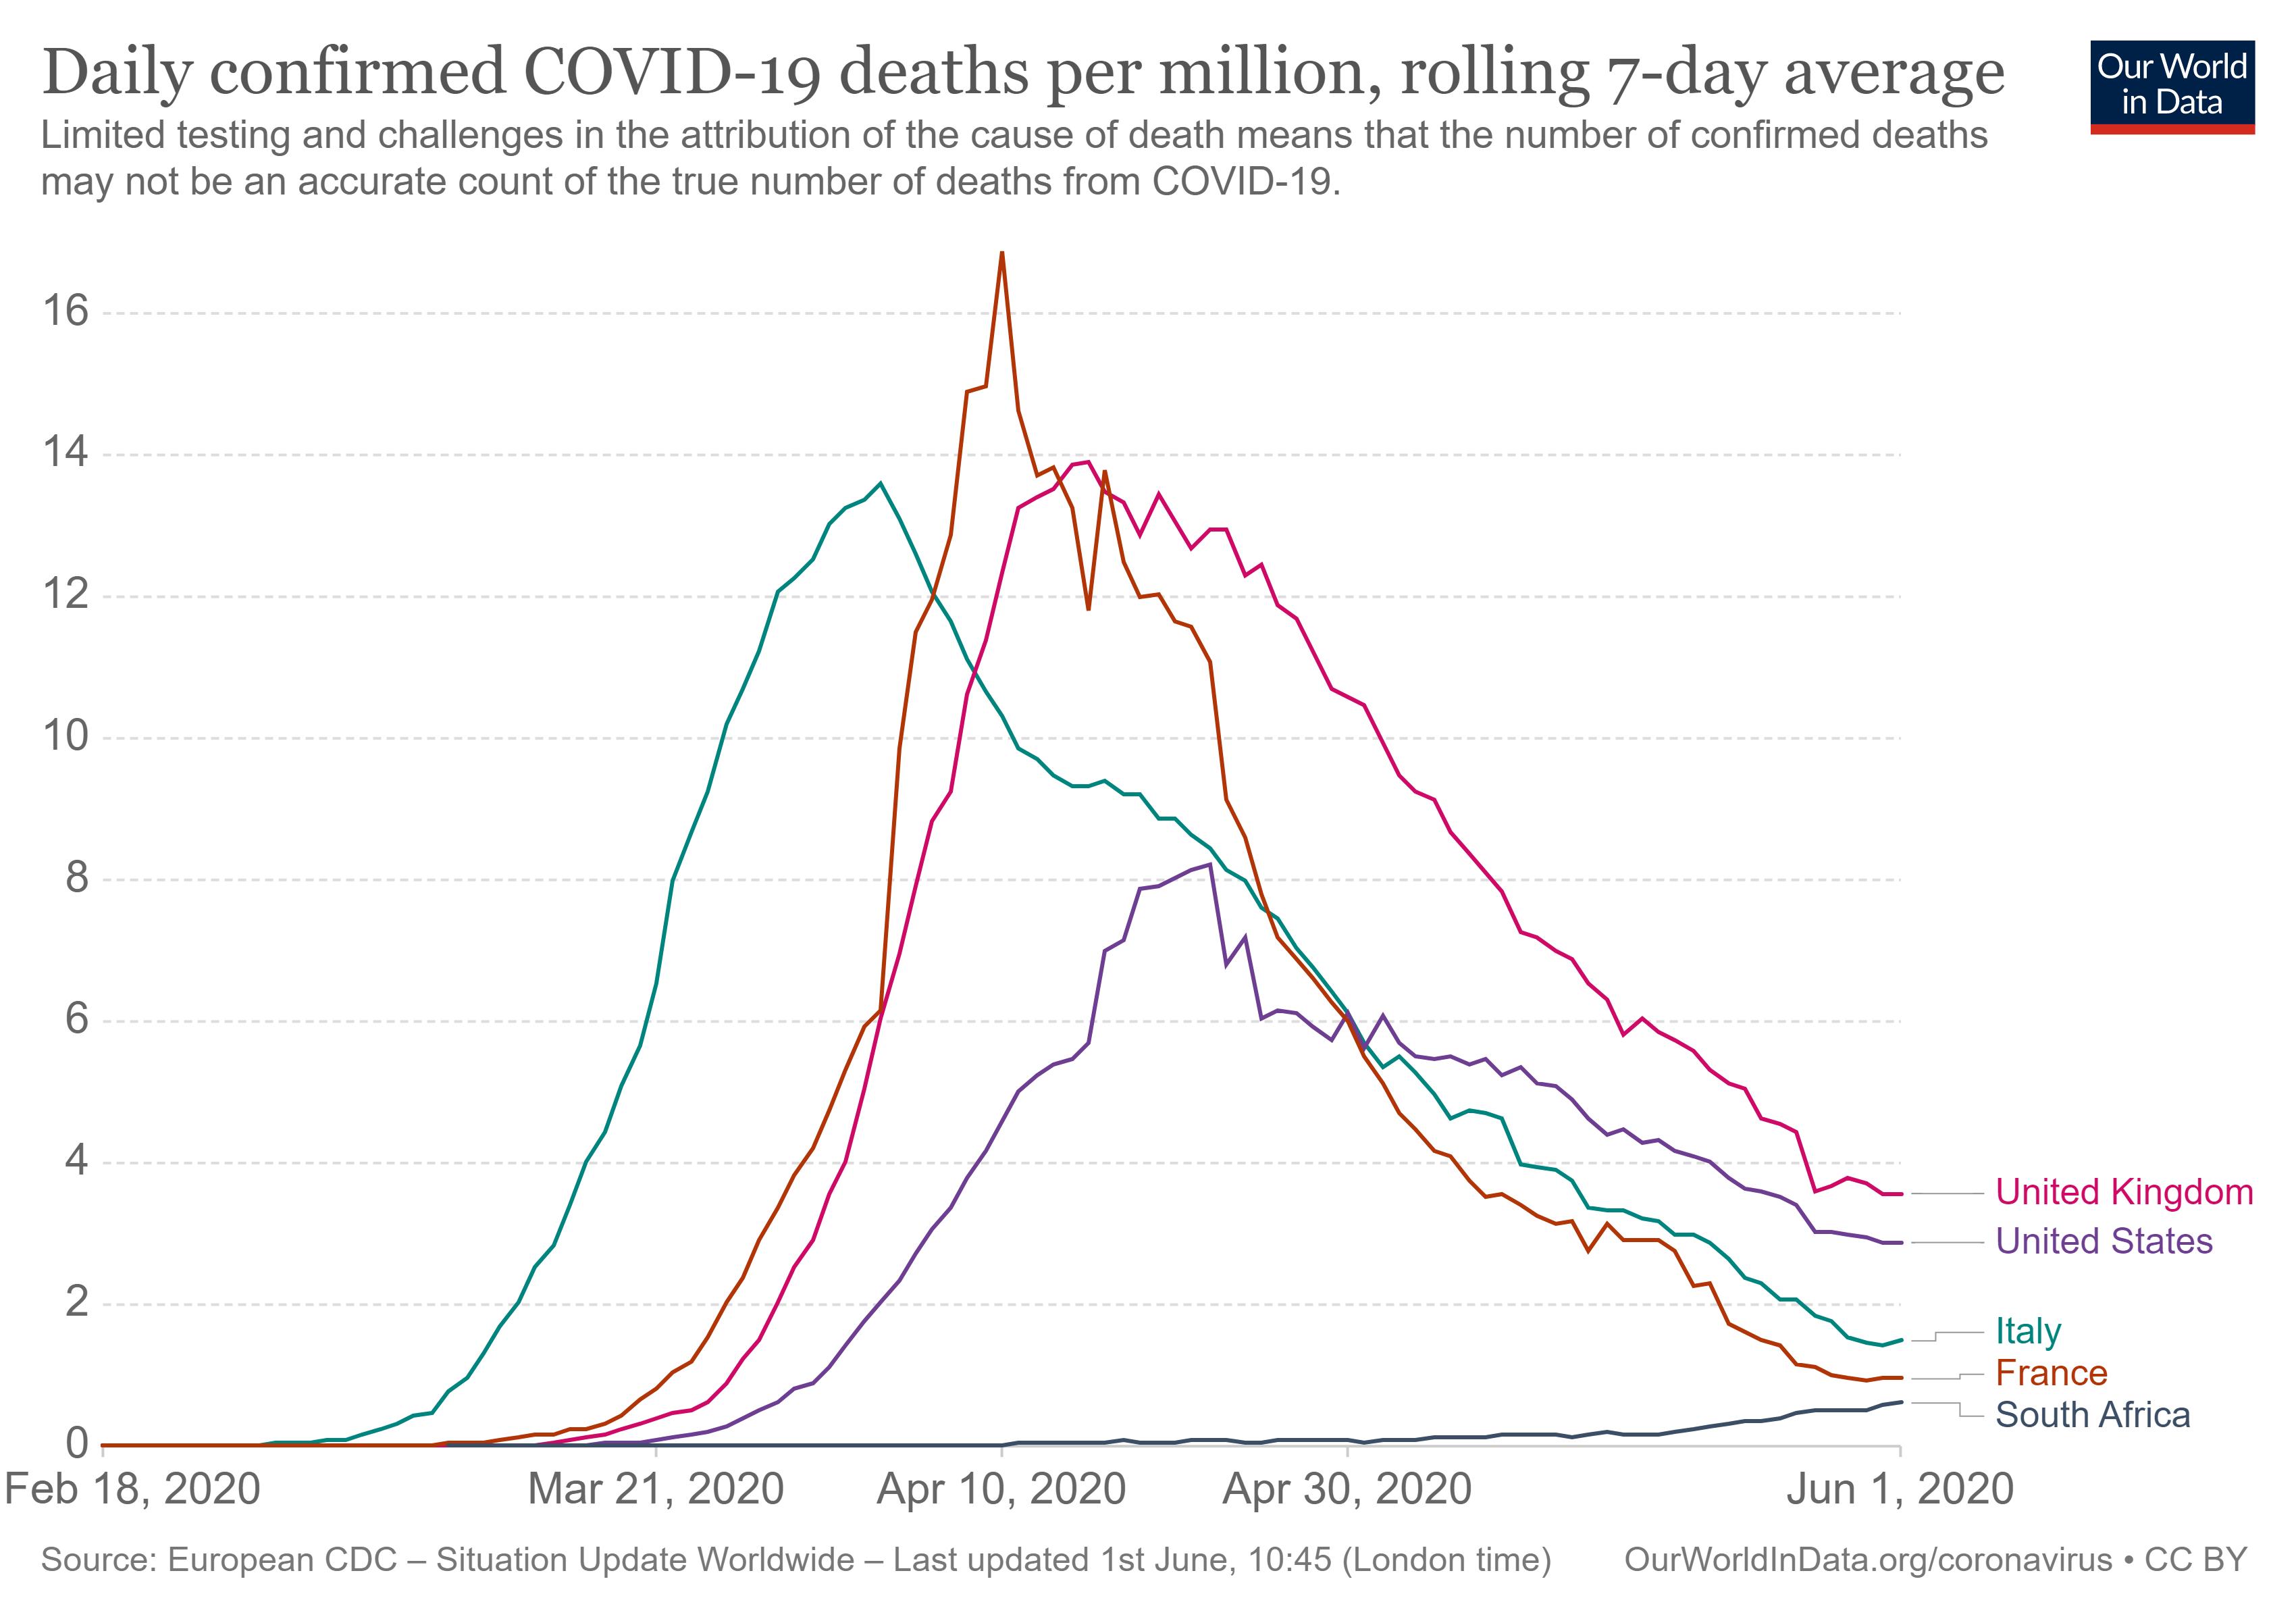 Figure 12: UK, USA, Italy, France vs RSA daily death toll (per million population)